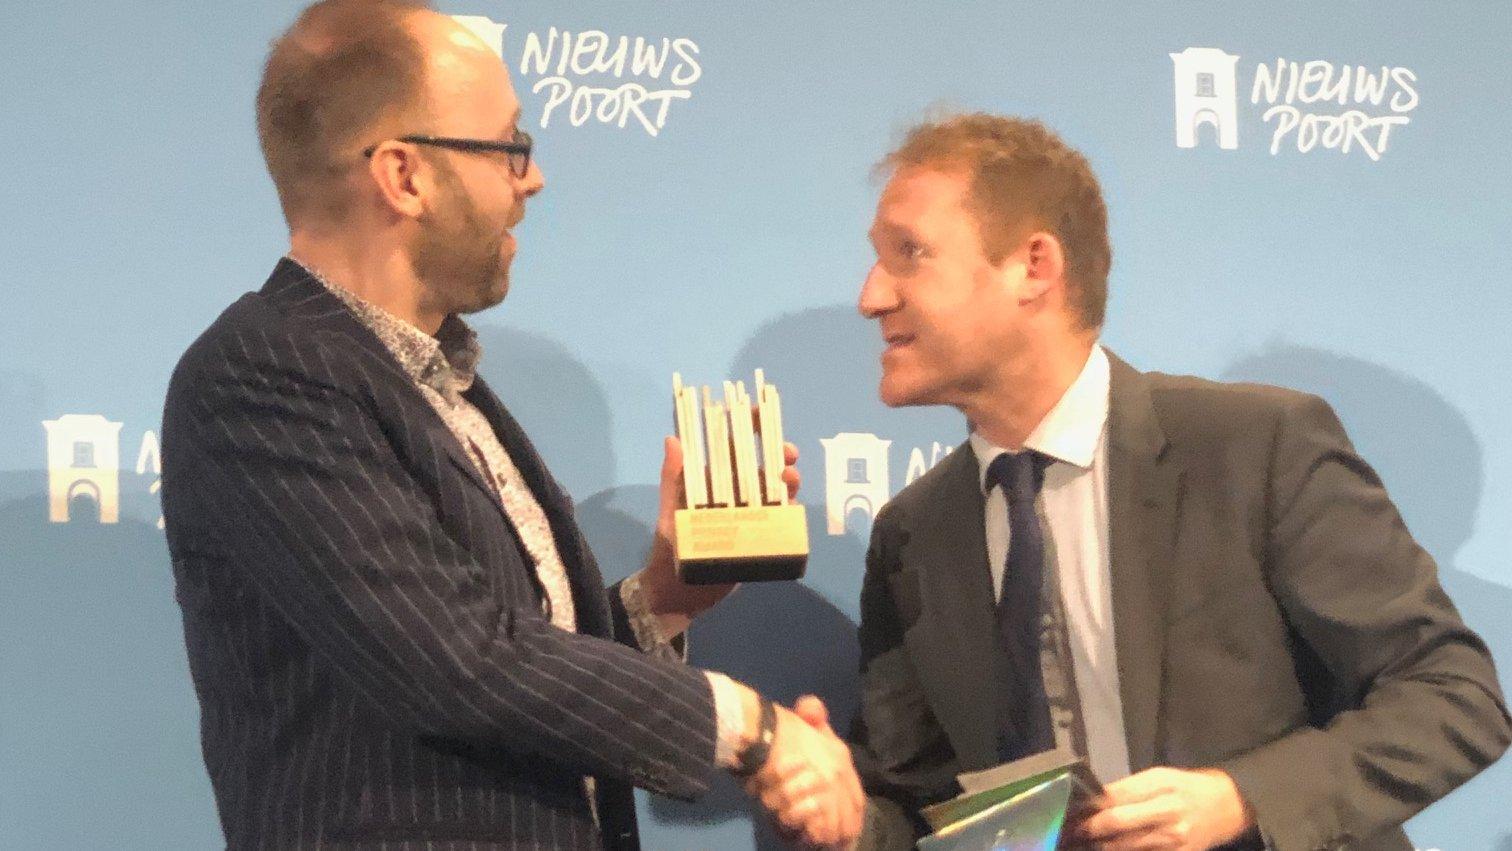 Candle has won a Dutch Privacy Award!